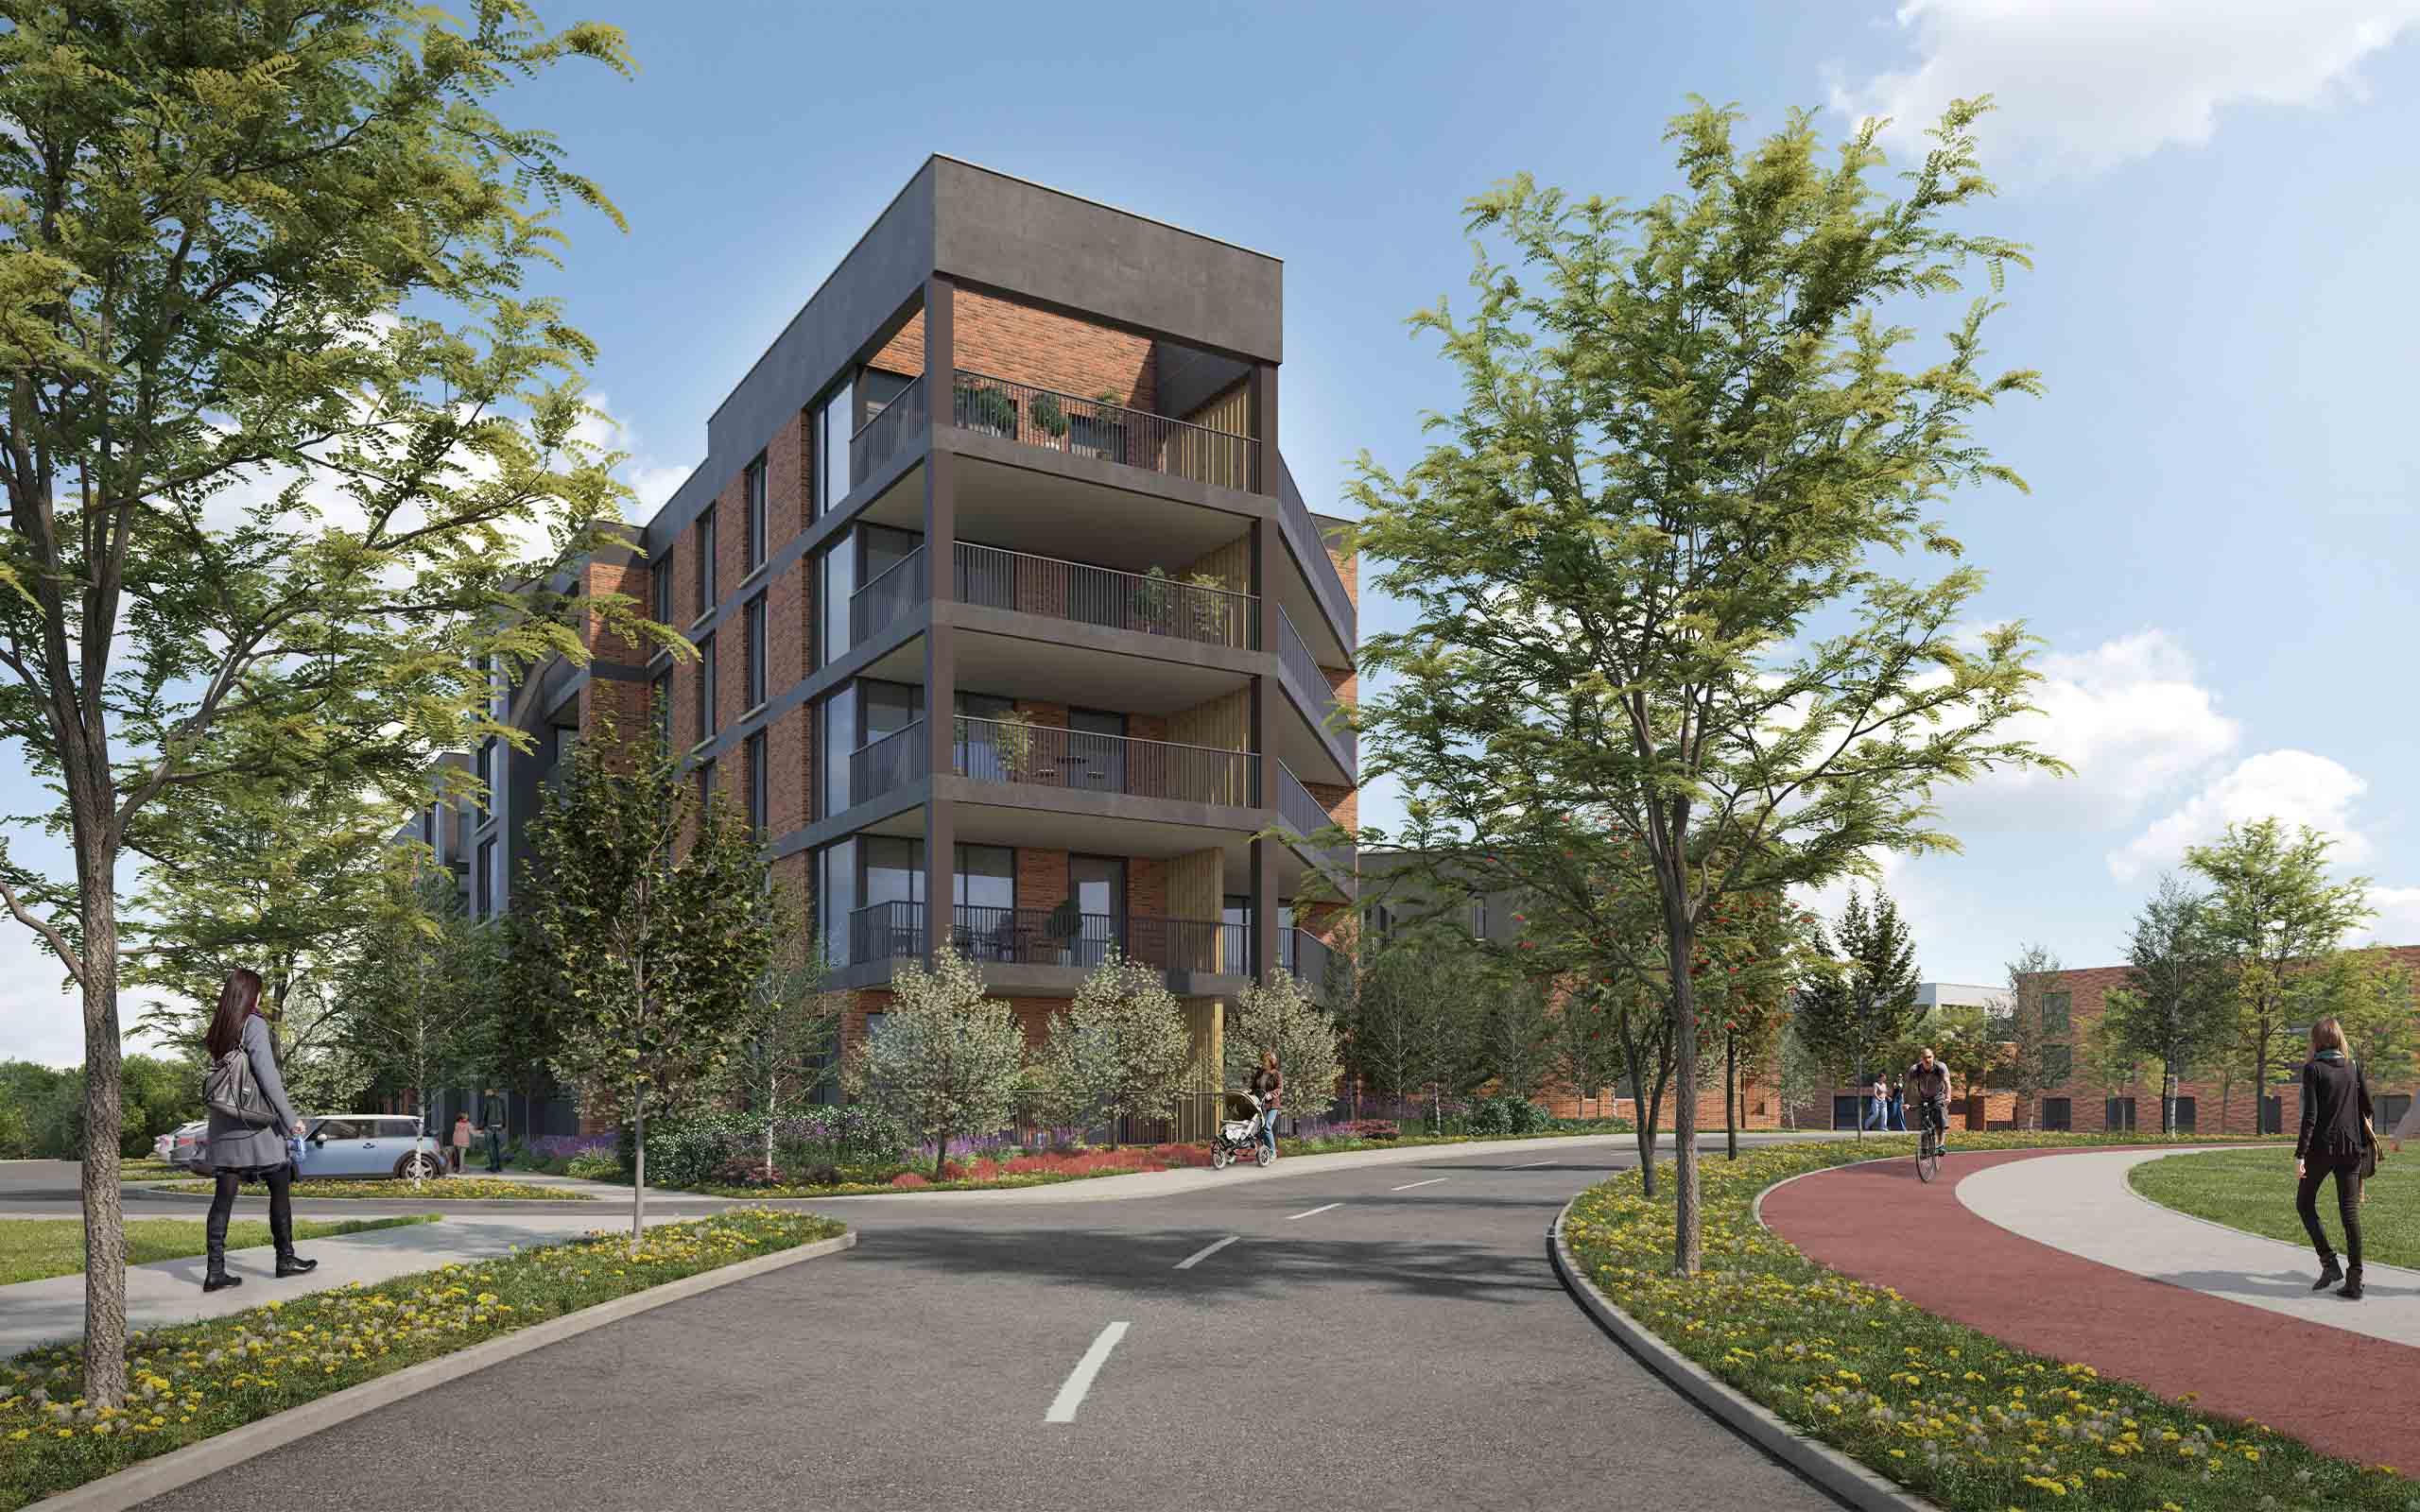 Architectural CGI of Residential Development in Lissywollen